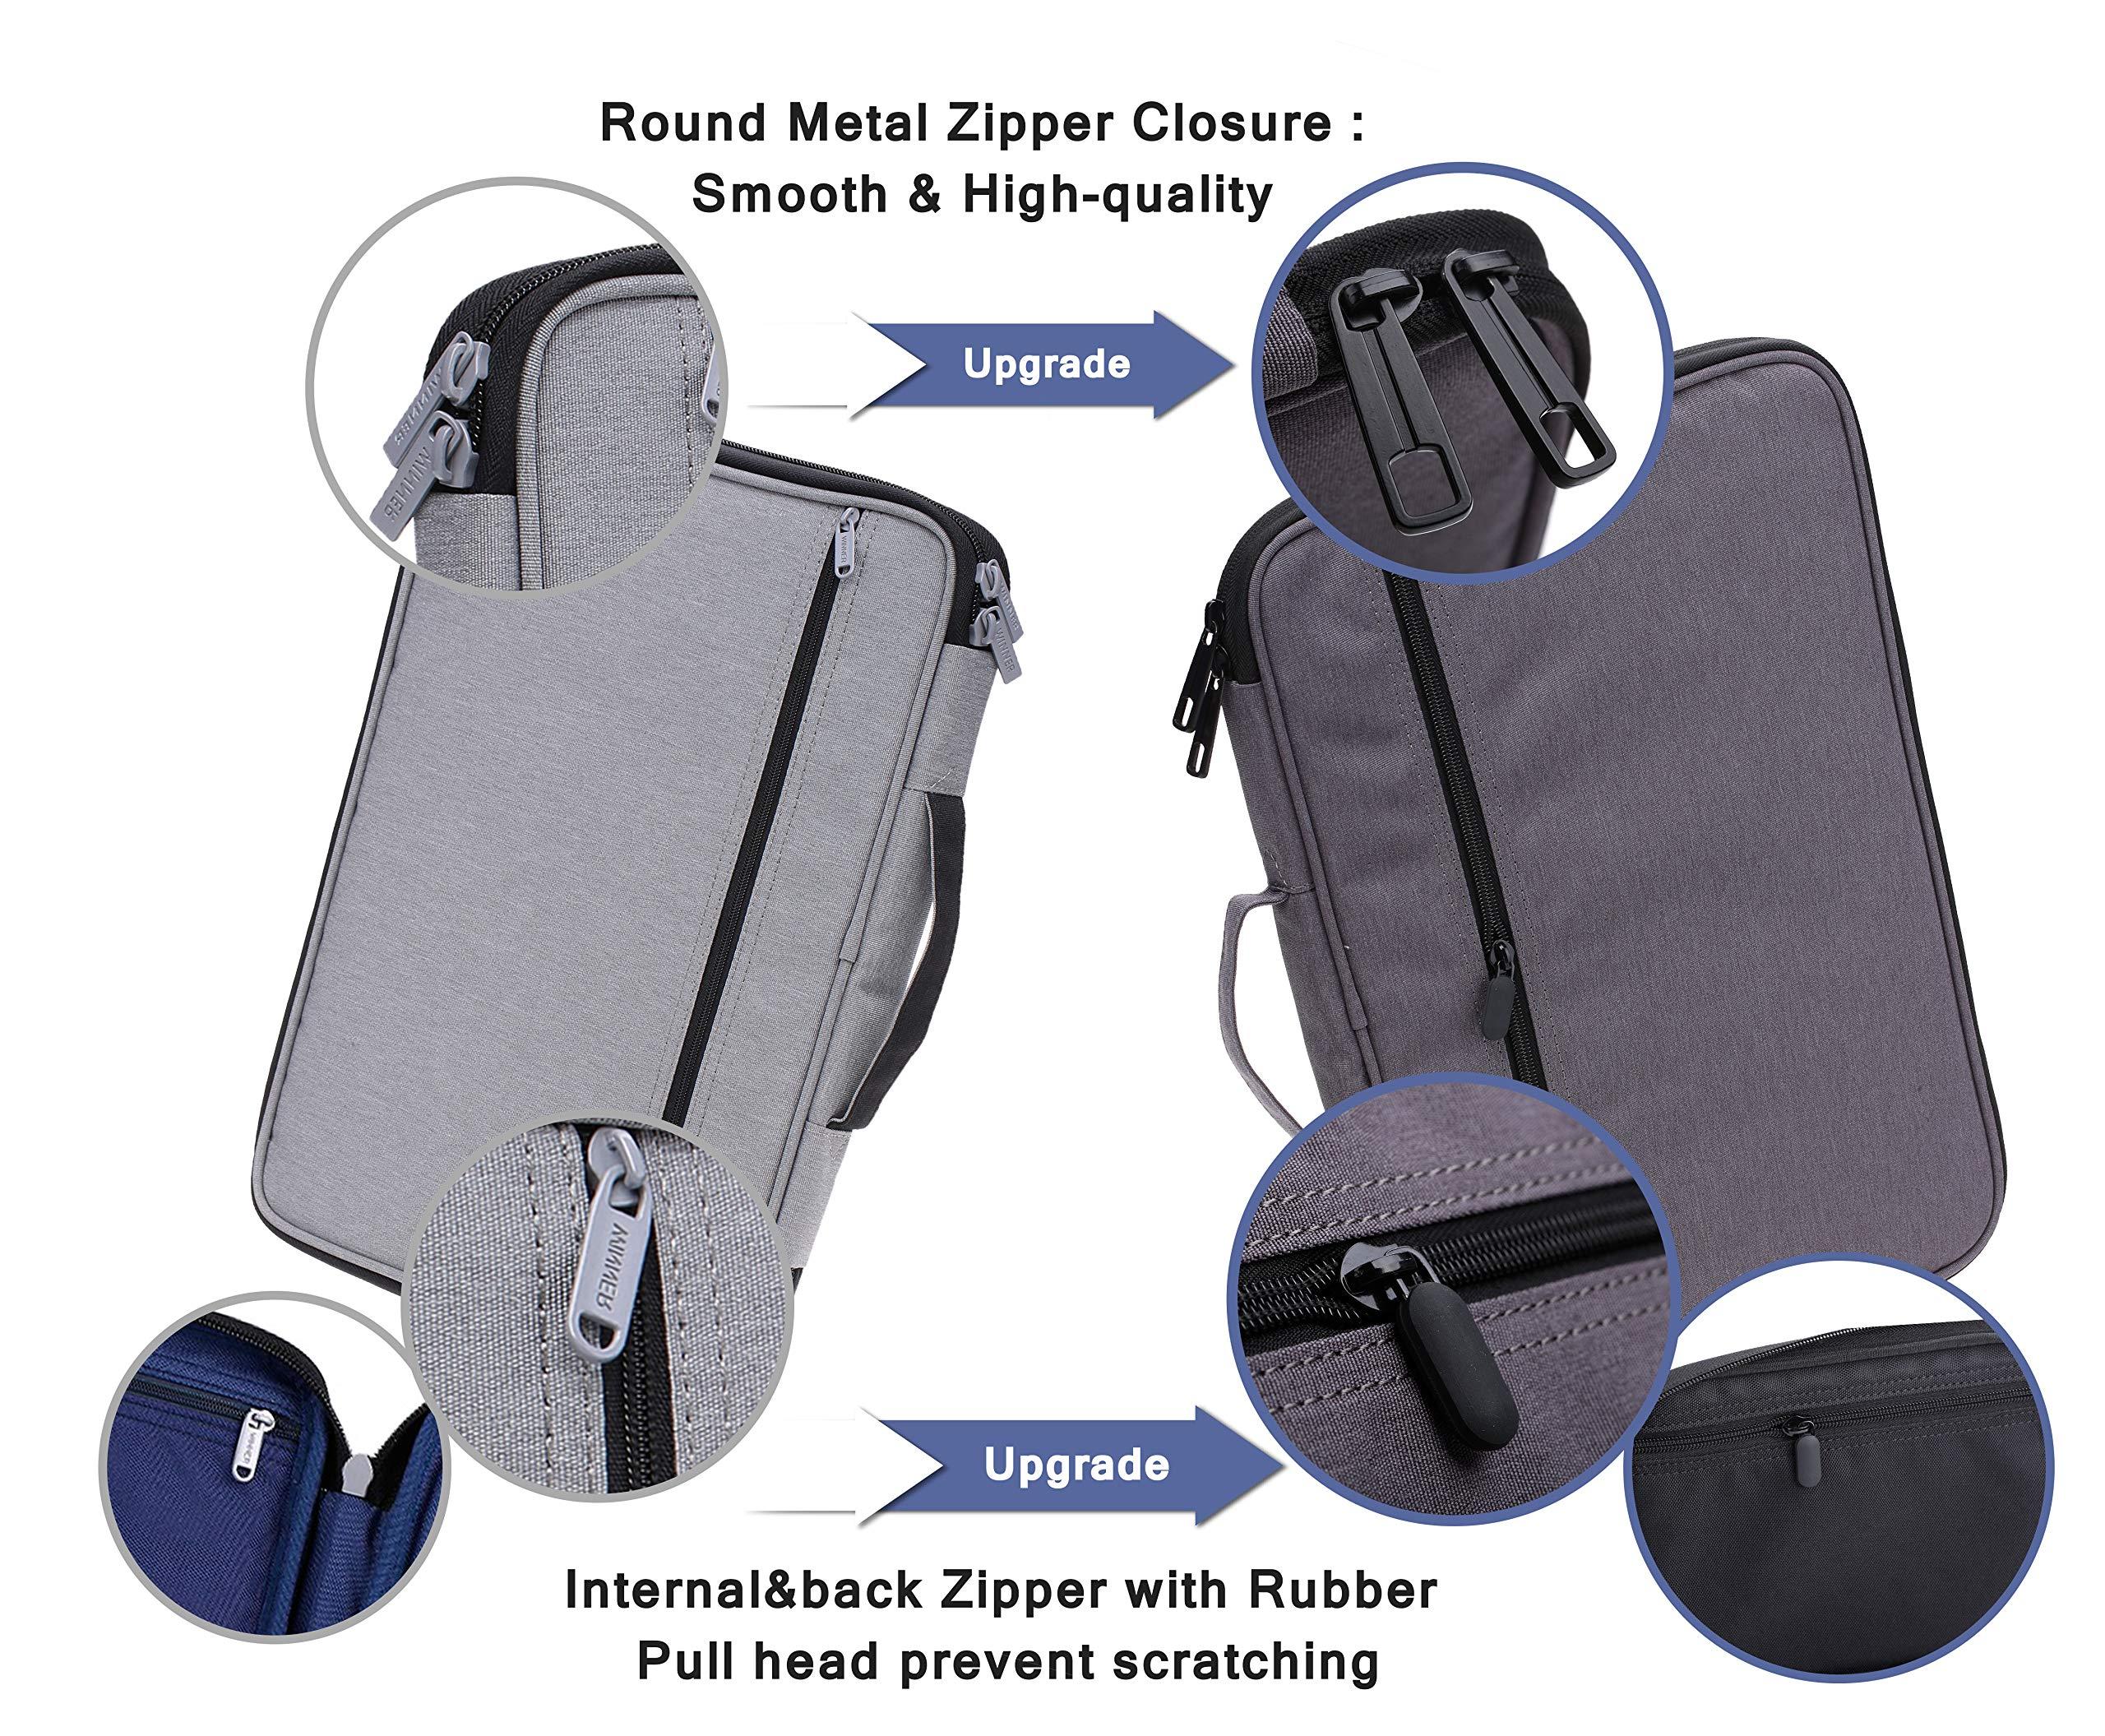 Lazyaunti Commercial Document Portfolio Padfolio Folders Organzier Binder Multi Function Waterproof Travel Pouch Zipper Case for Laptop, Ipad, Kindle, Notebook, Pen (Dark Grey)